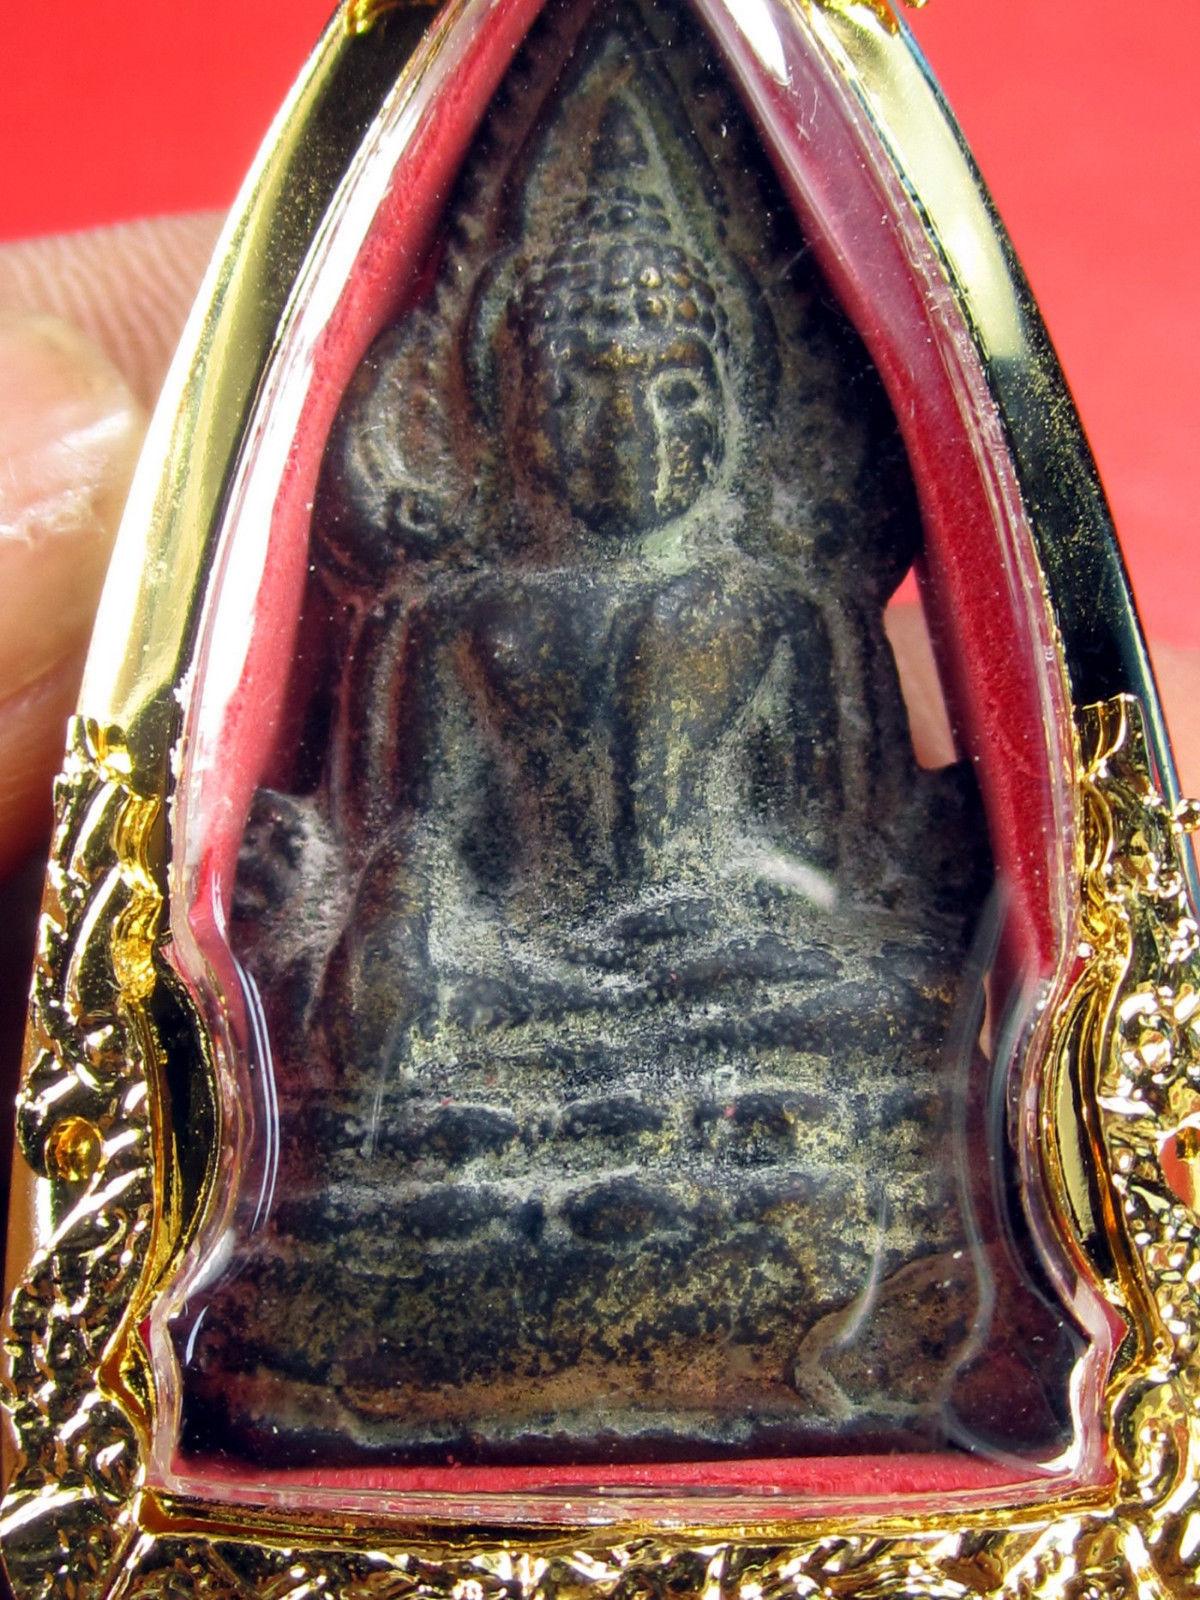 VERY RARE HOLY PHRA BUDDHA CHIN-NARAT WAT YAI 300 YEARS TOP THAI BUDDHA AMULETS